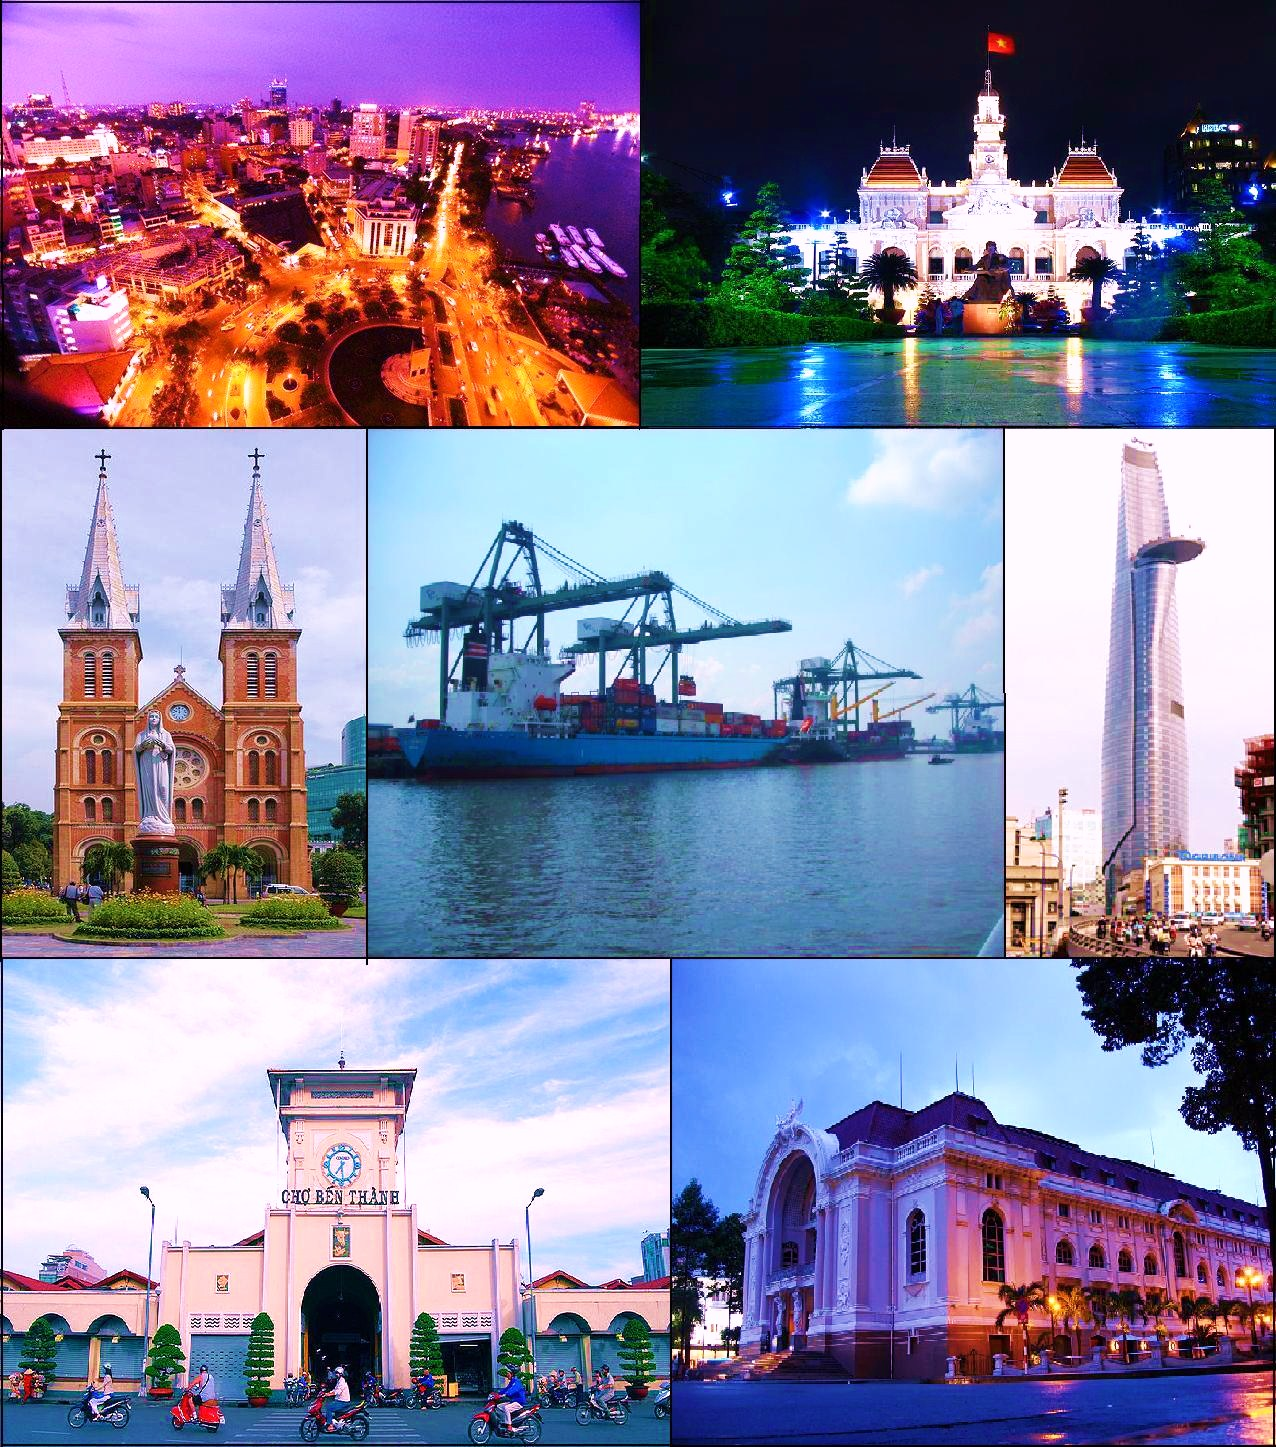 Tour xuyen Viet Ha Noi Sai Gon, hanh trinh du lich xuyen viet